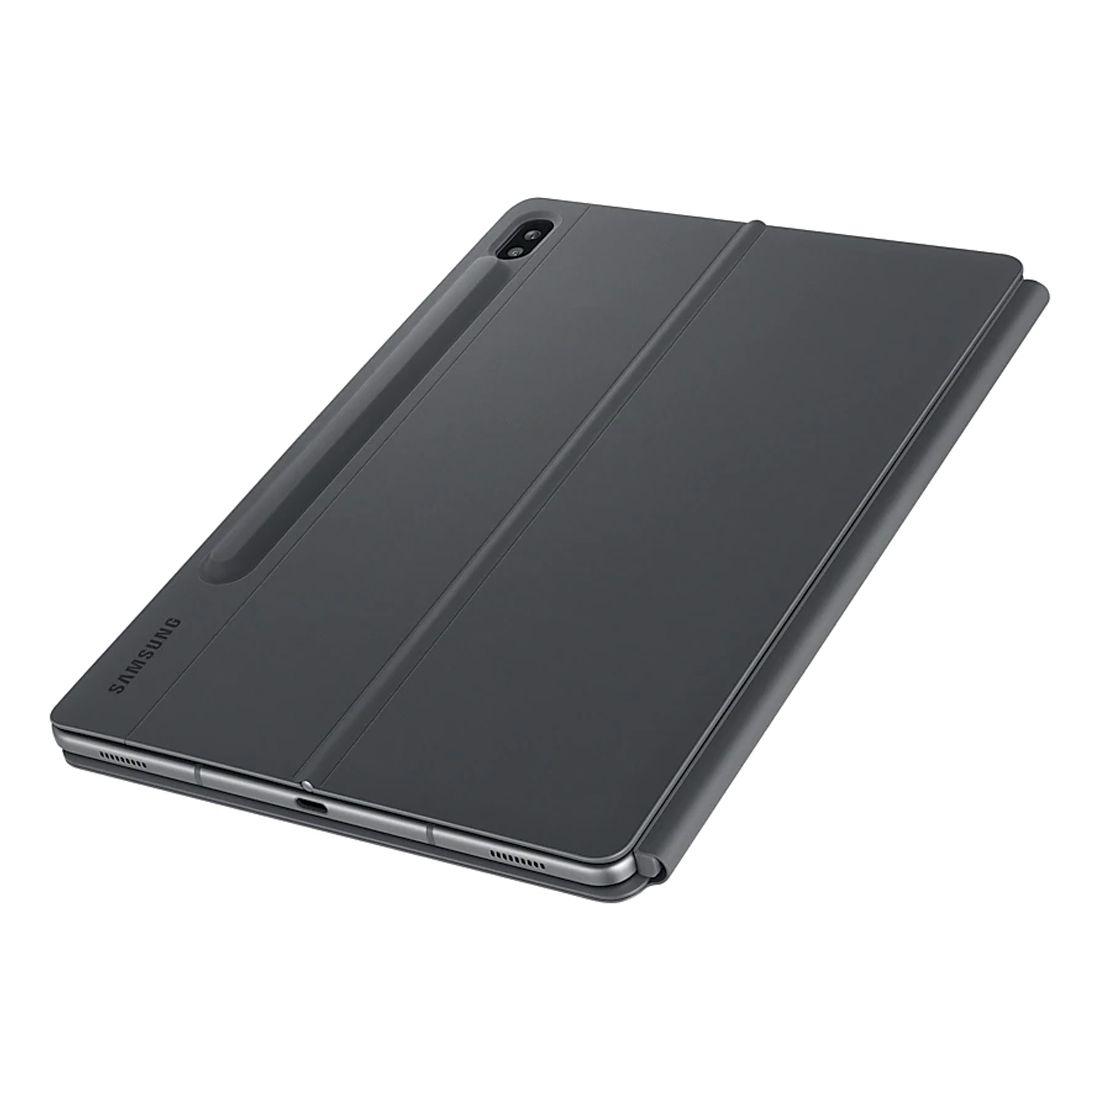 Samsung Galaxy Tab S6 10.5 Keyboard Book Cover - Grey